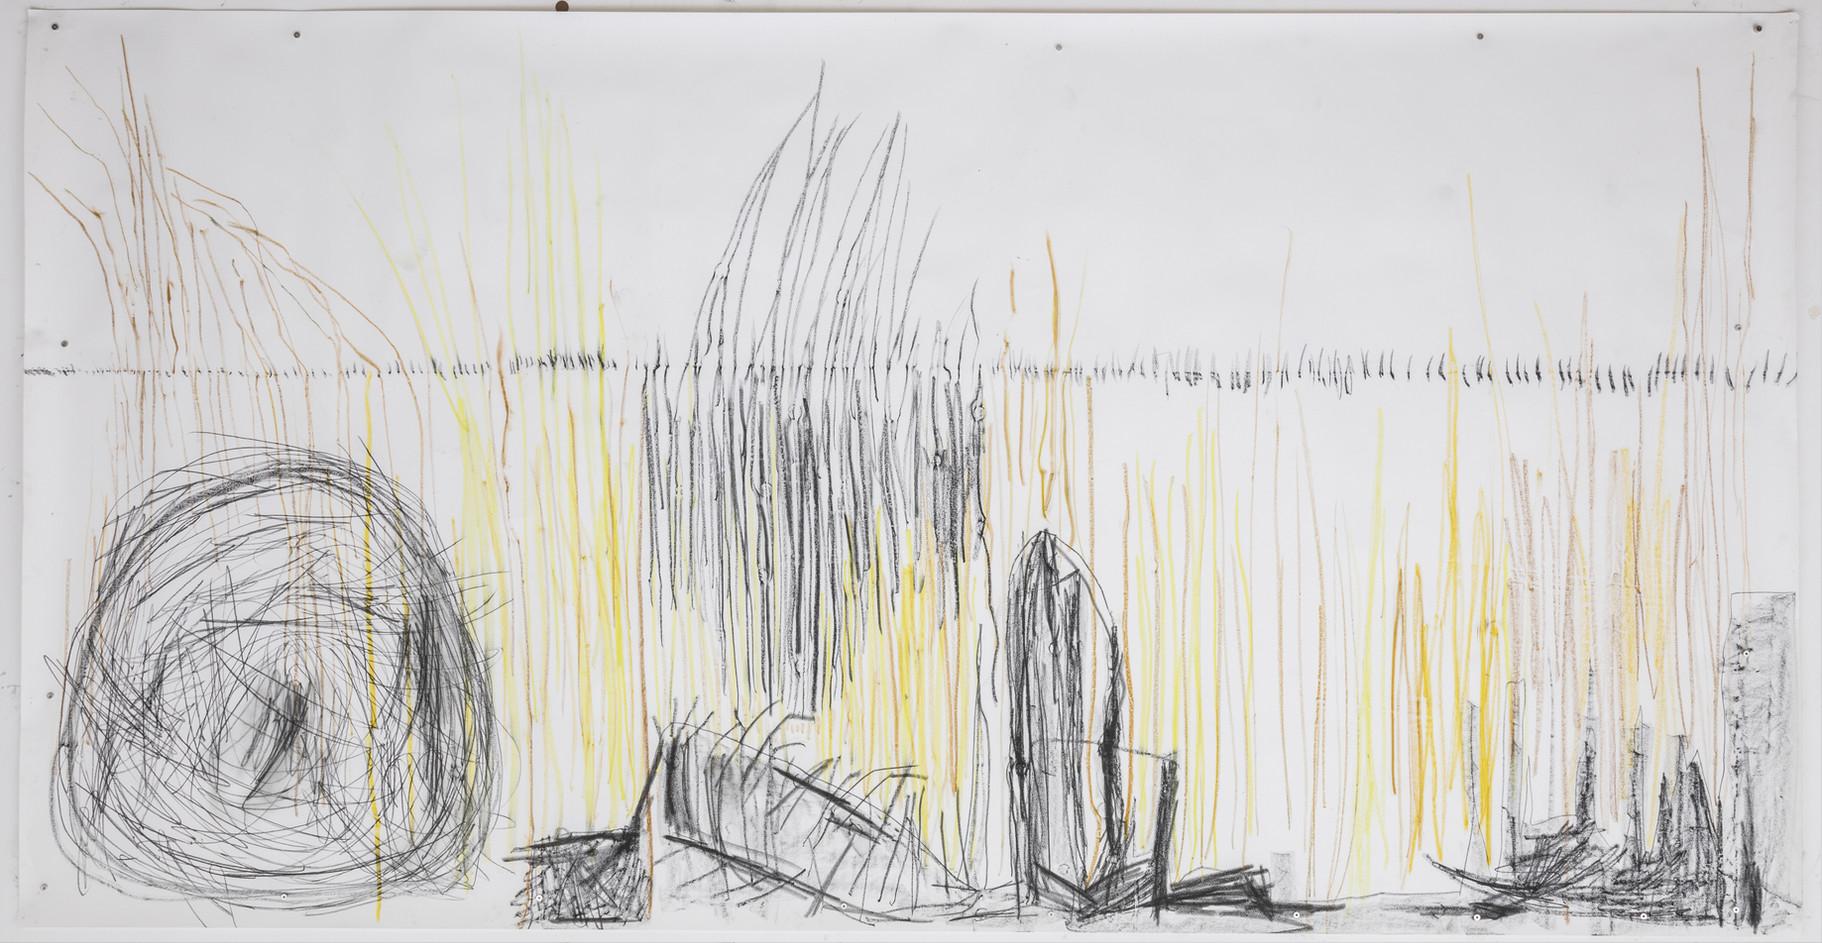 154 x 294 cm giz pastel seco, lápis conté sobre papel foto: Ruy Teixeira